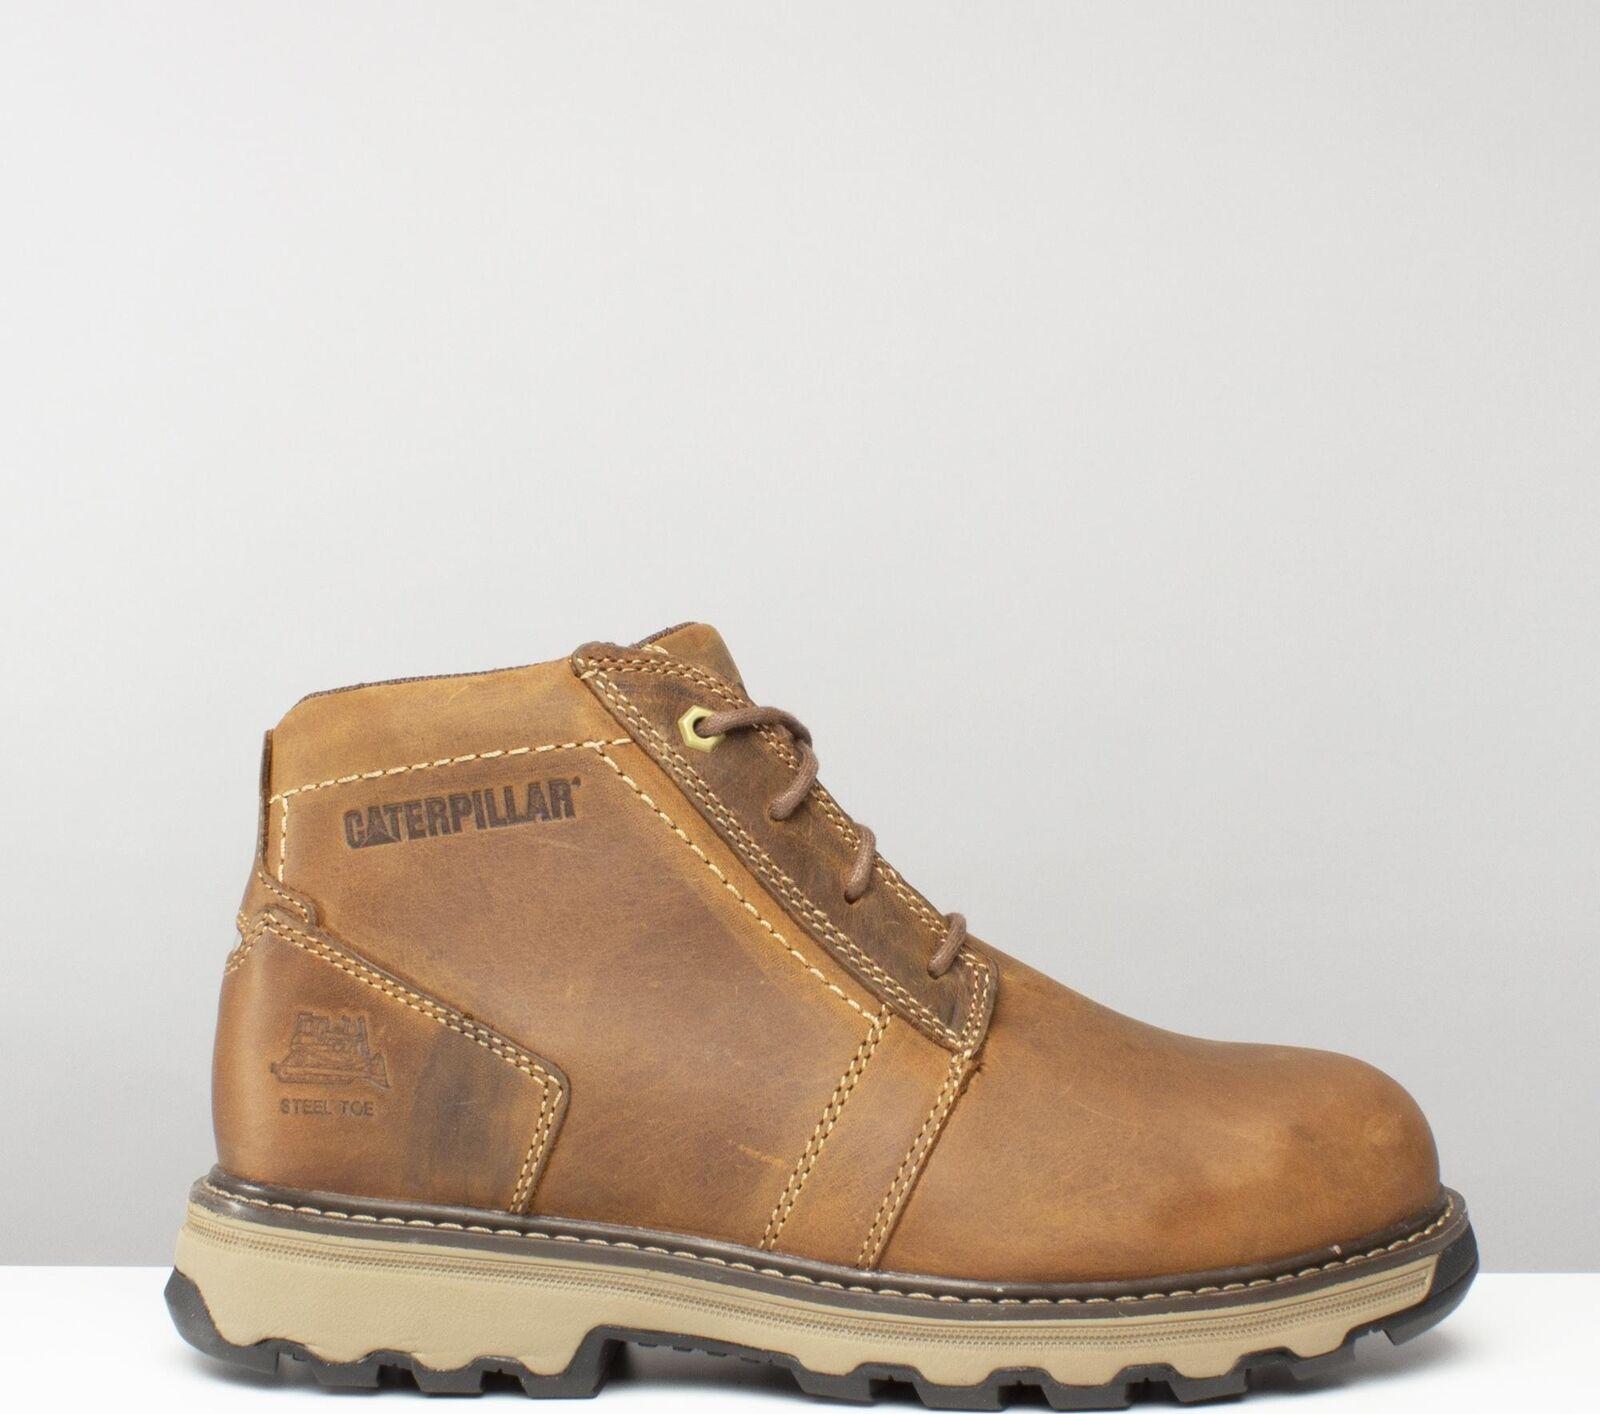 Cat ® PARKER Mens Nubuck S1 SRA Ankle Safety Steel Toecap Work Boots Dark Beige